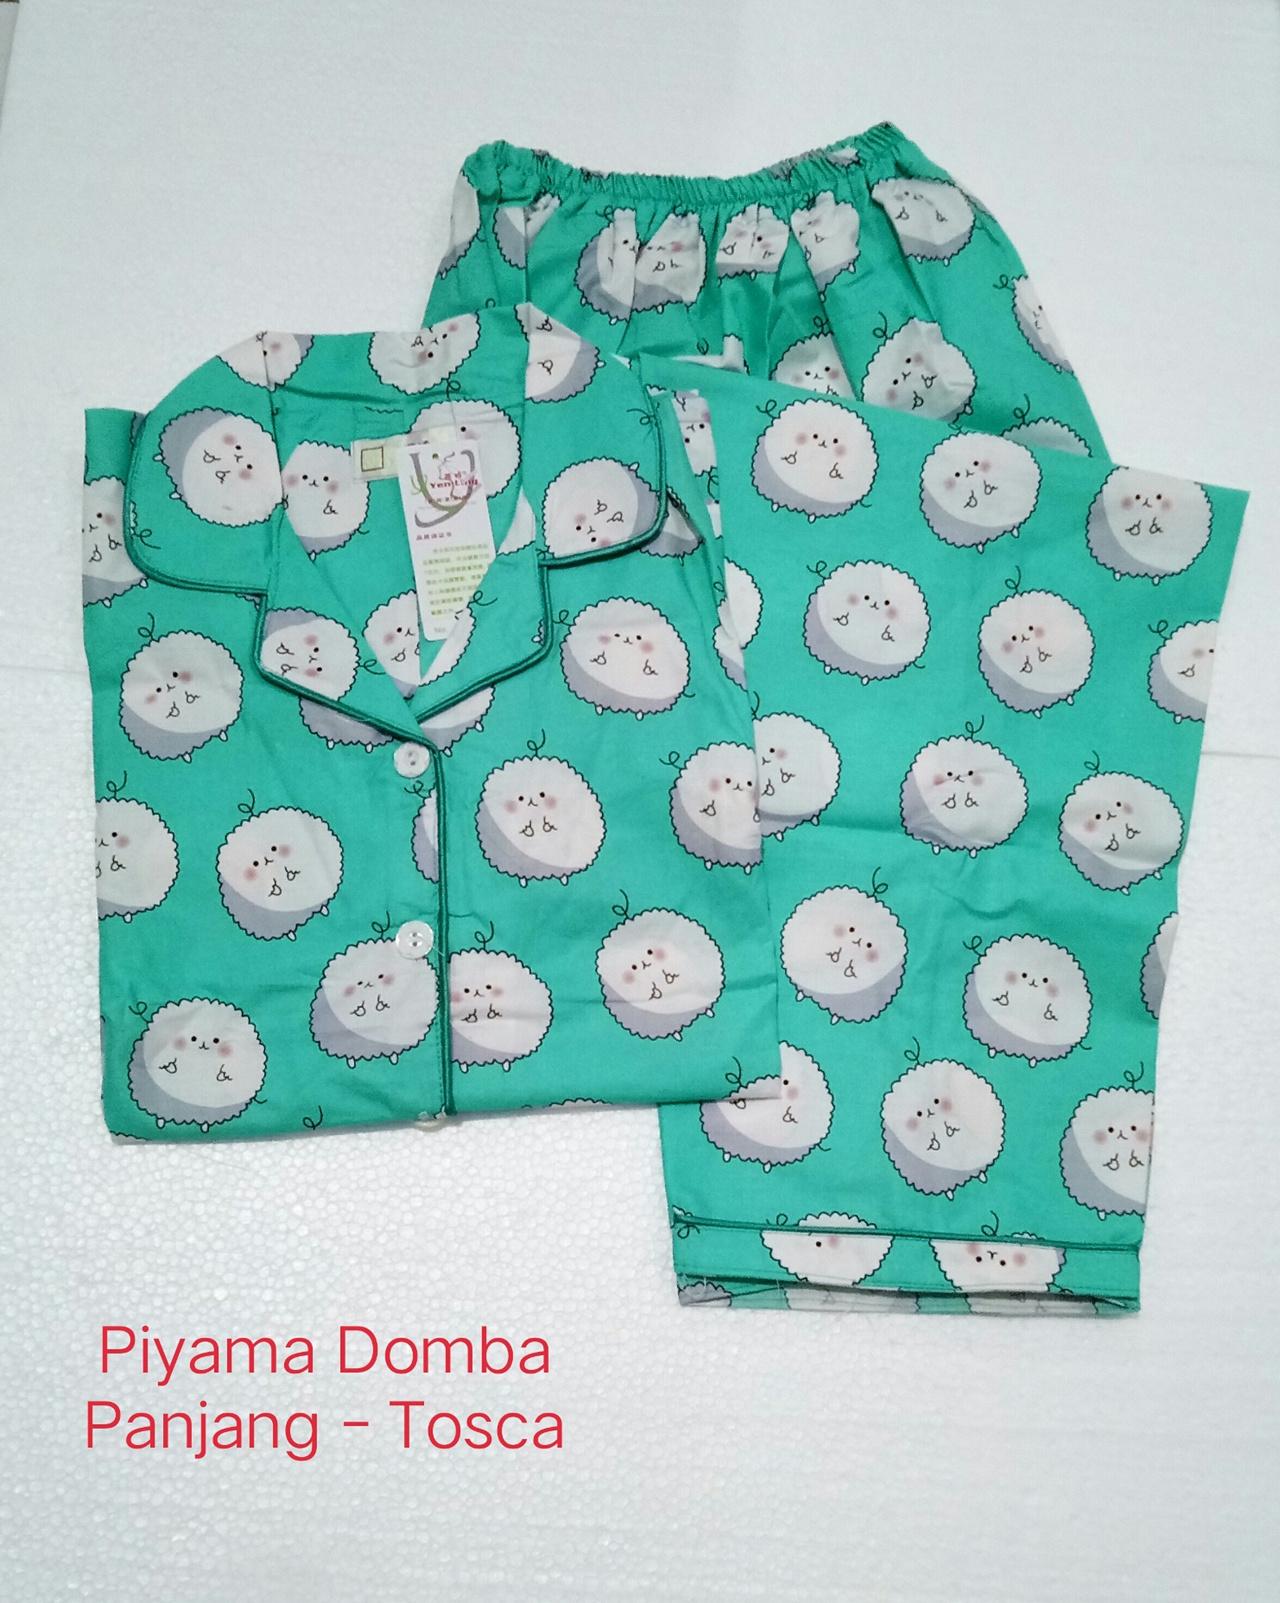 Fortune Fashion Piyama Domba Panjang Bahan Katun Jepang Tebal Fit to XL Ld 104cm. Busui